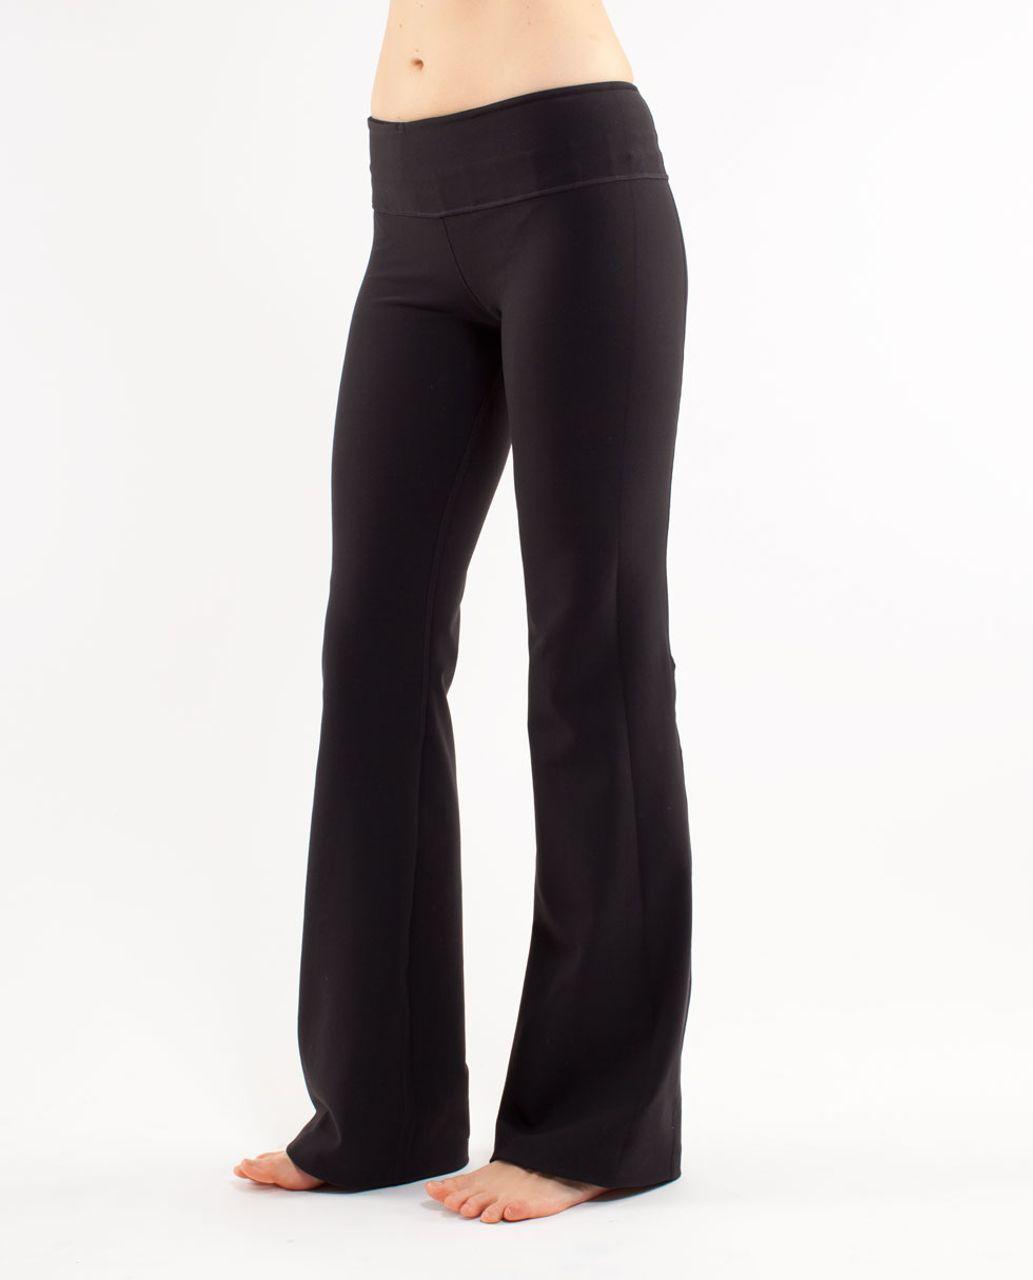 Lululemon Groove Pant (Regular) - Black /  Heathered Fossil /  Quilting Spring 16